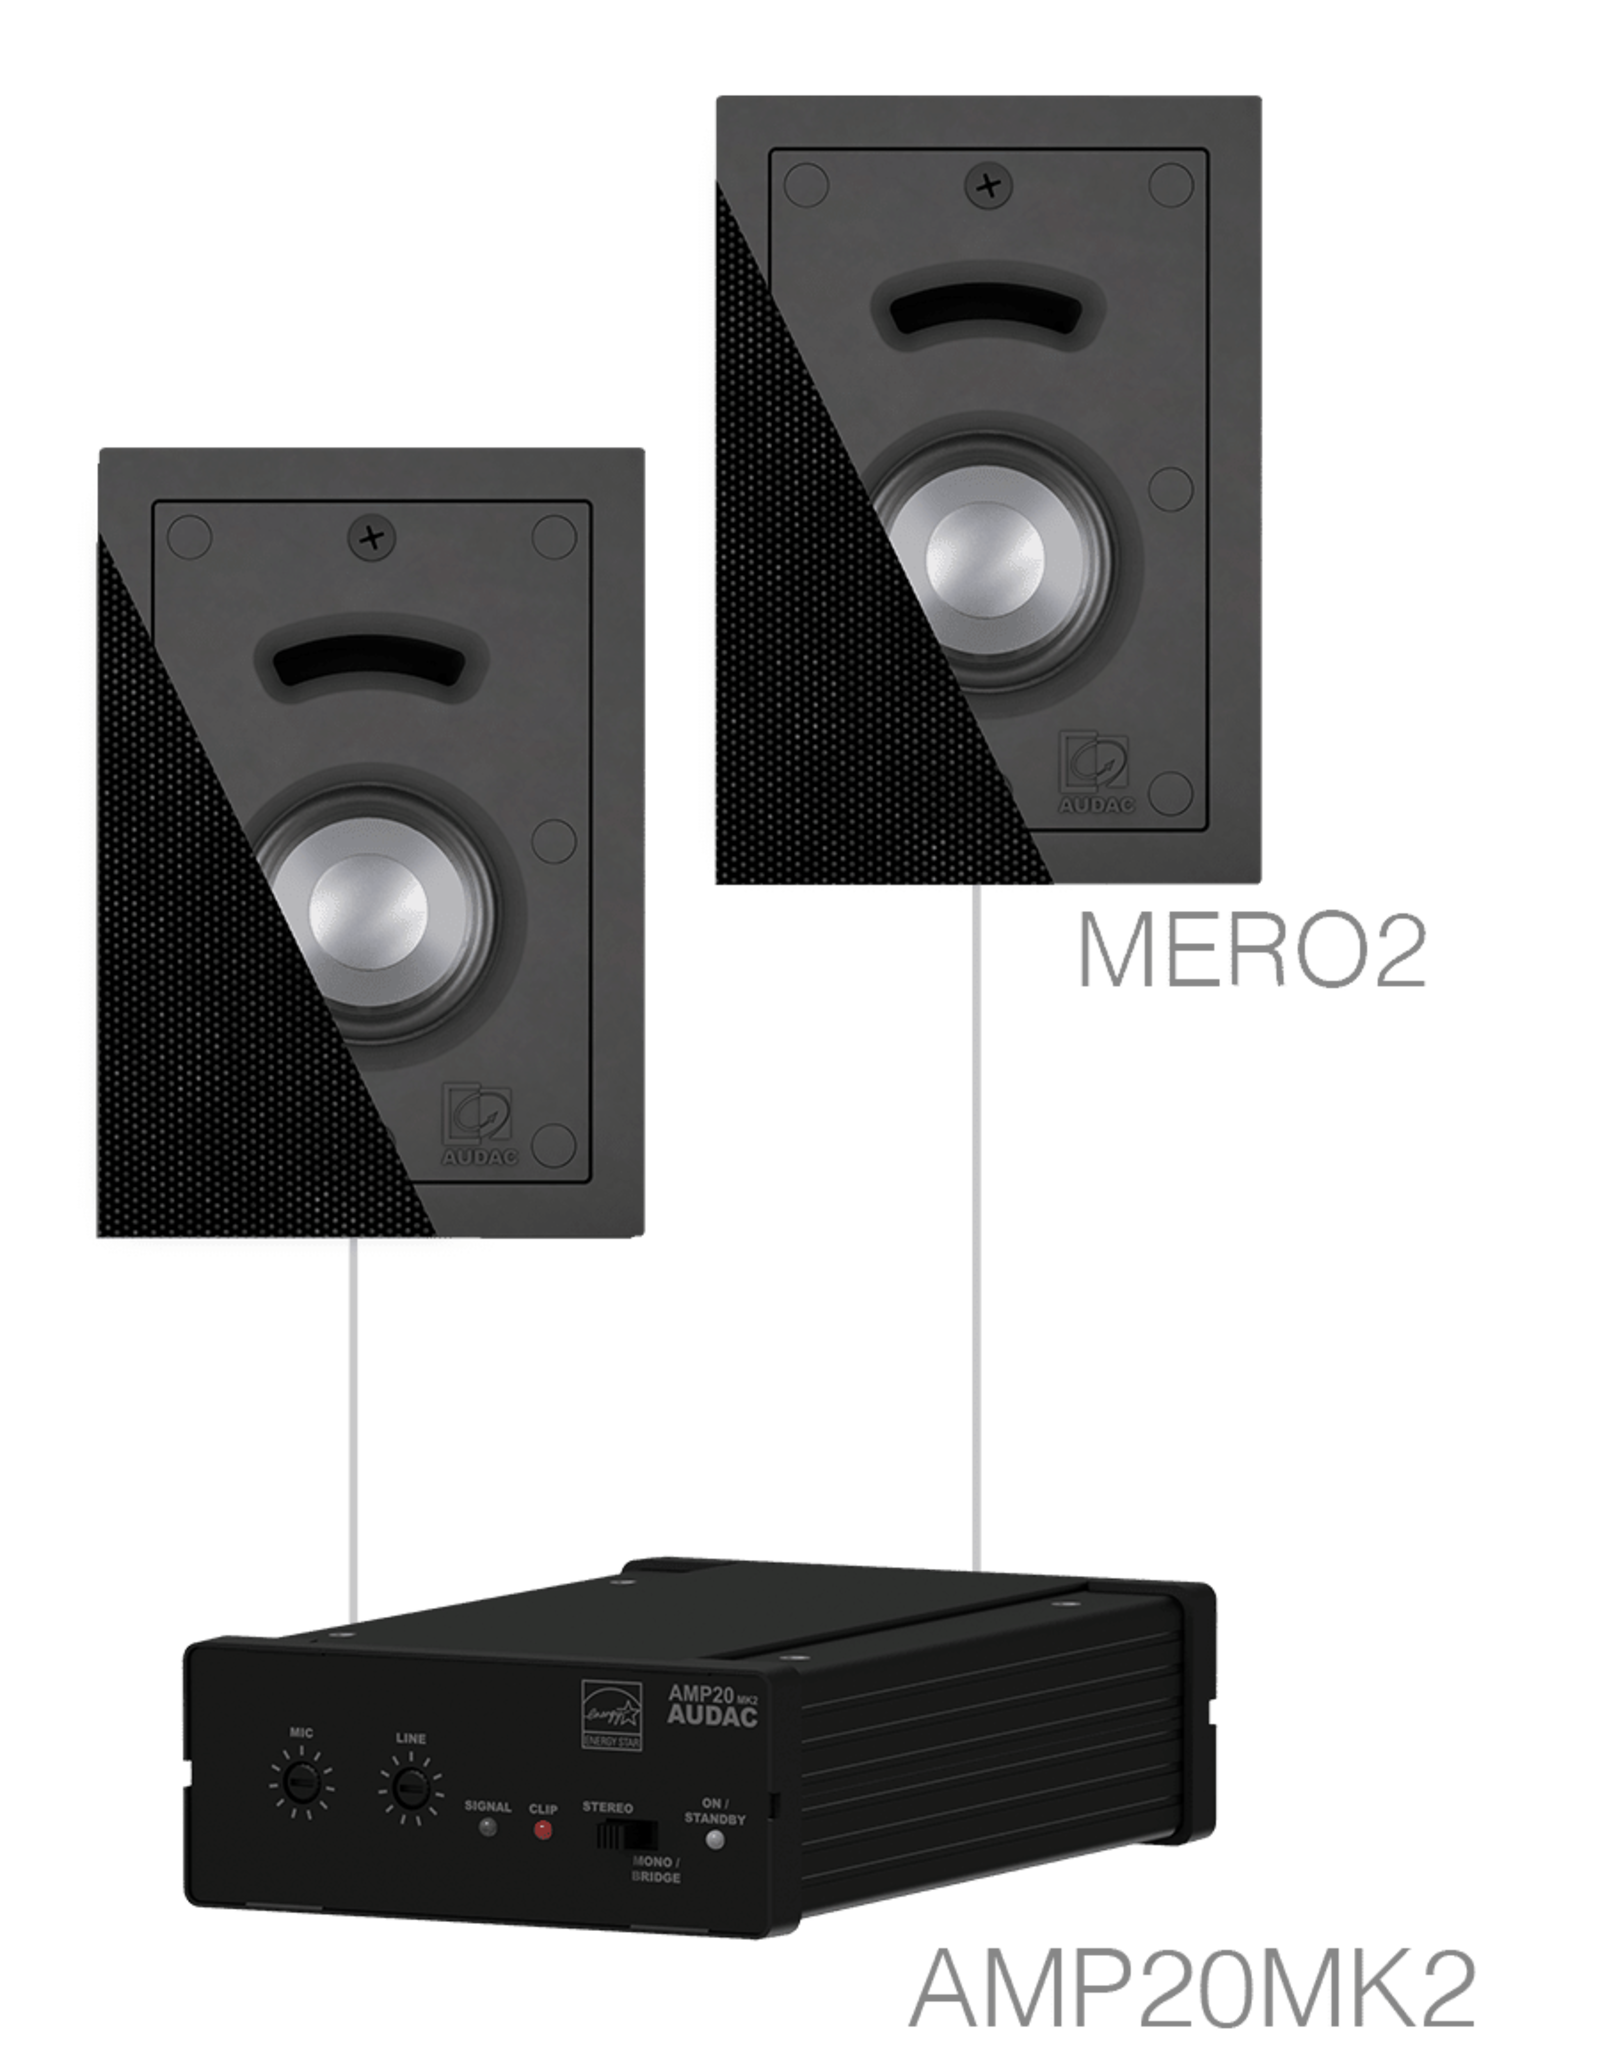 Audac 2 x MERO2 + AMP20MK2 Black version